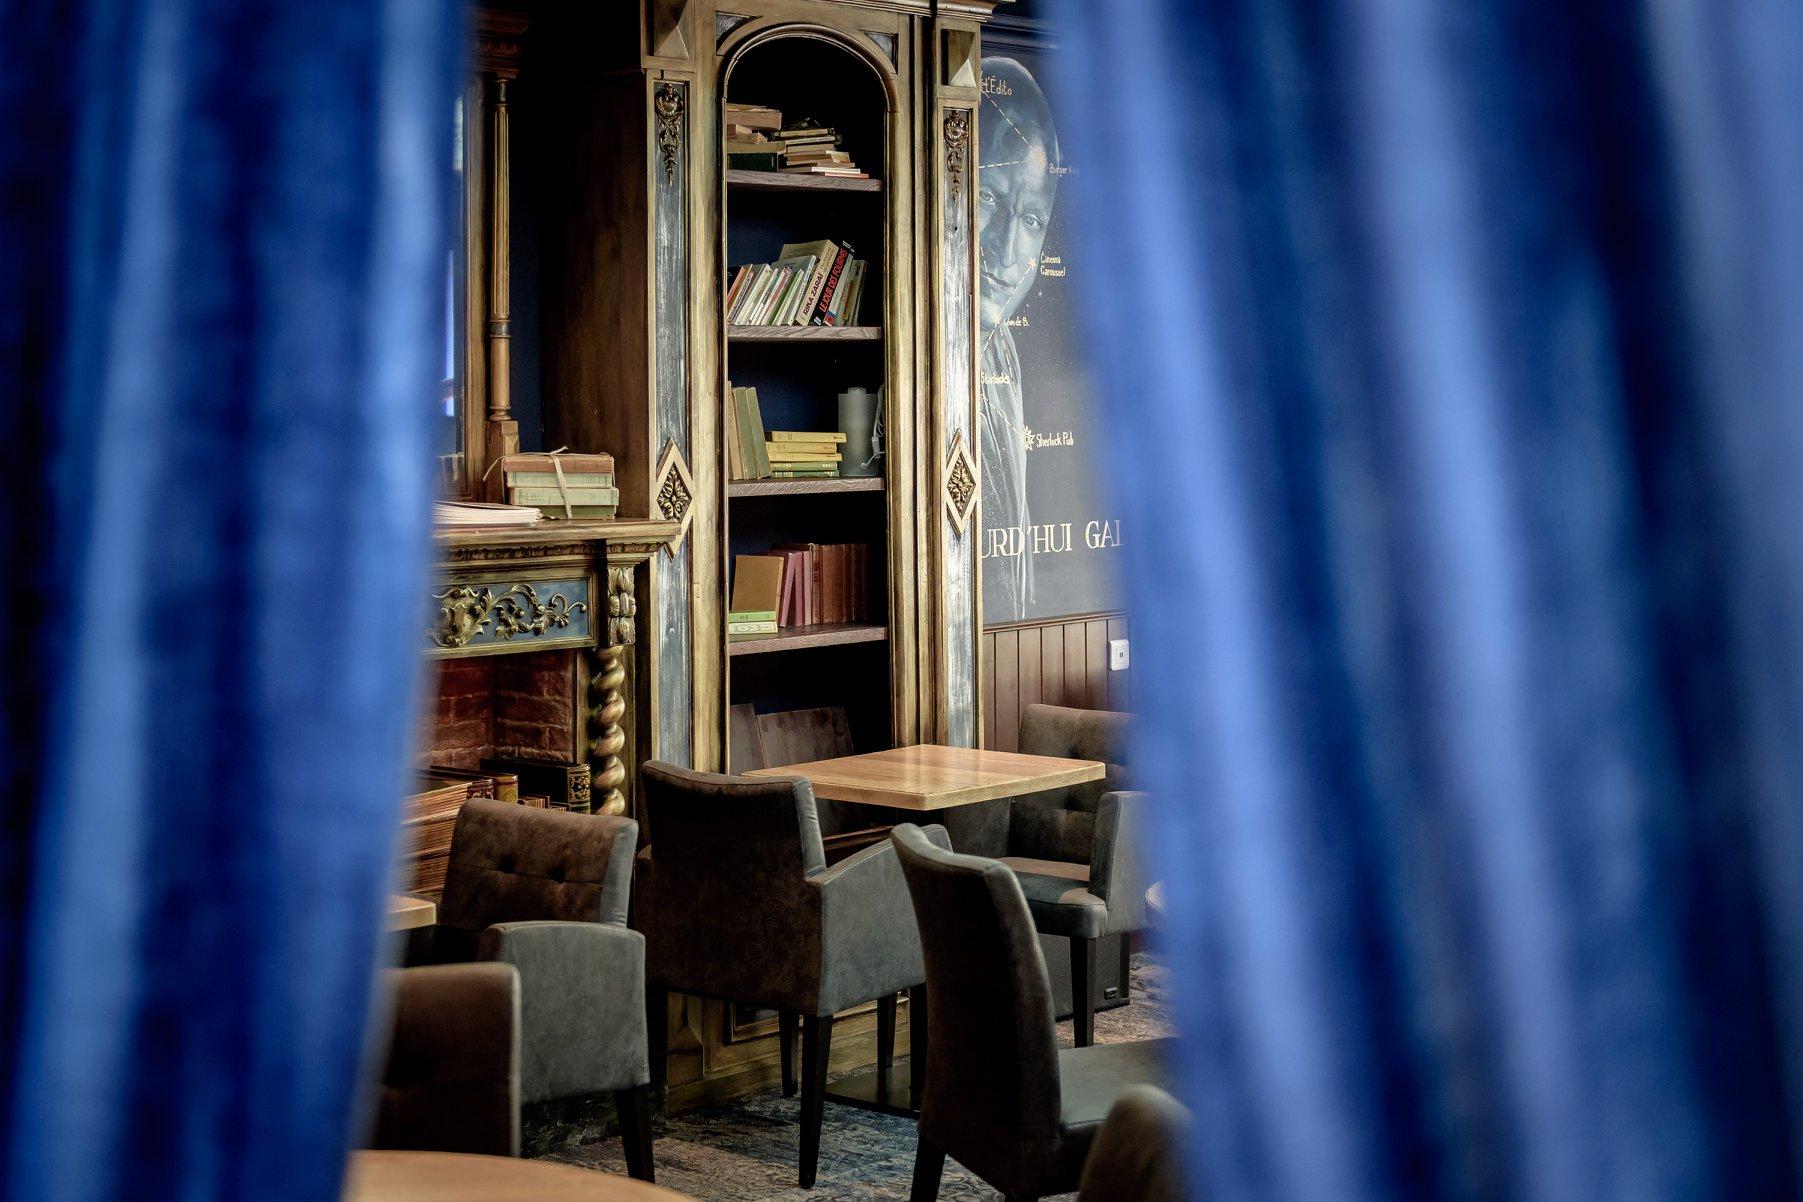 Mr Fogg's Pub Reims salle etage